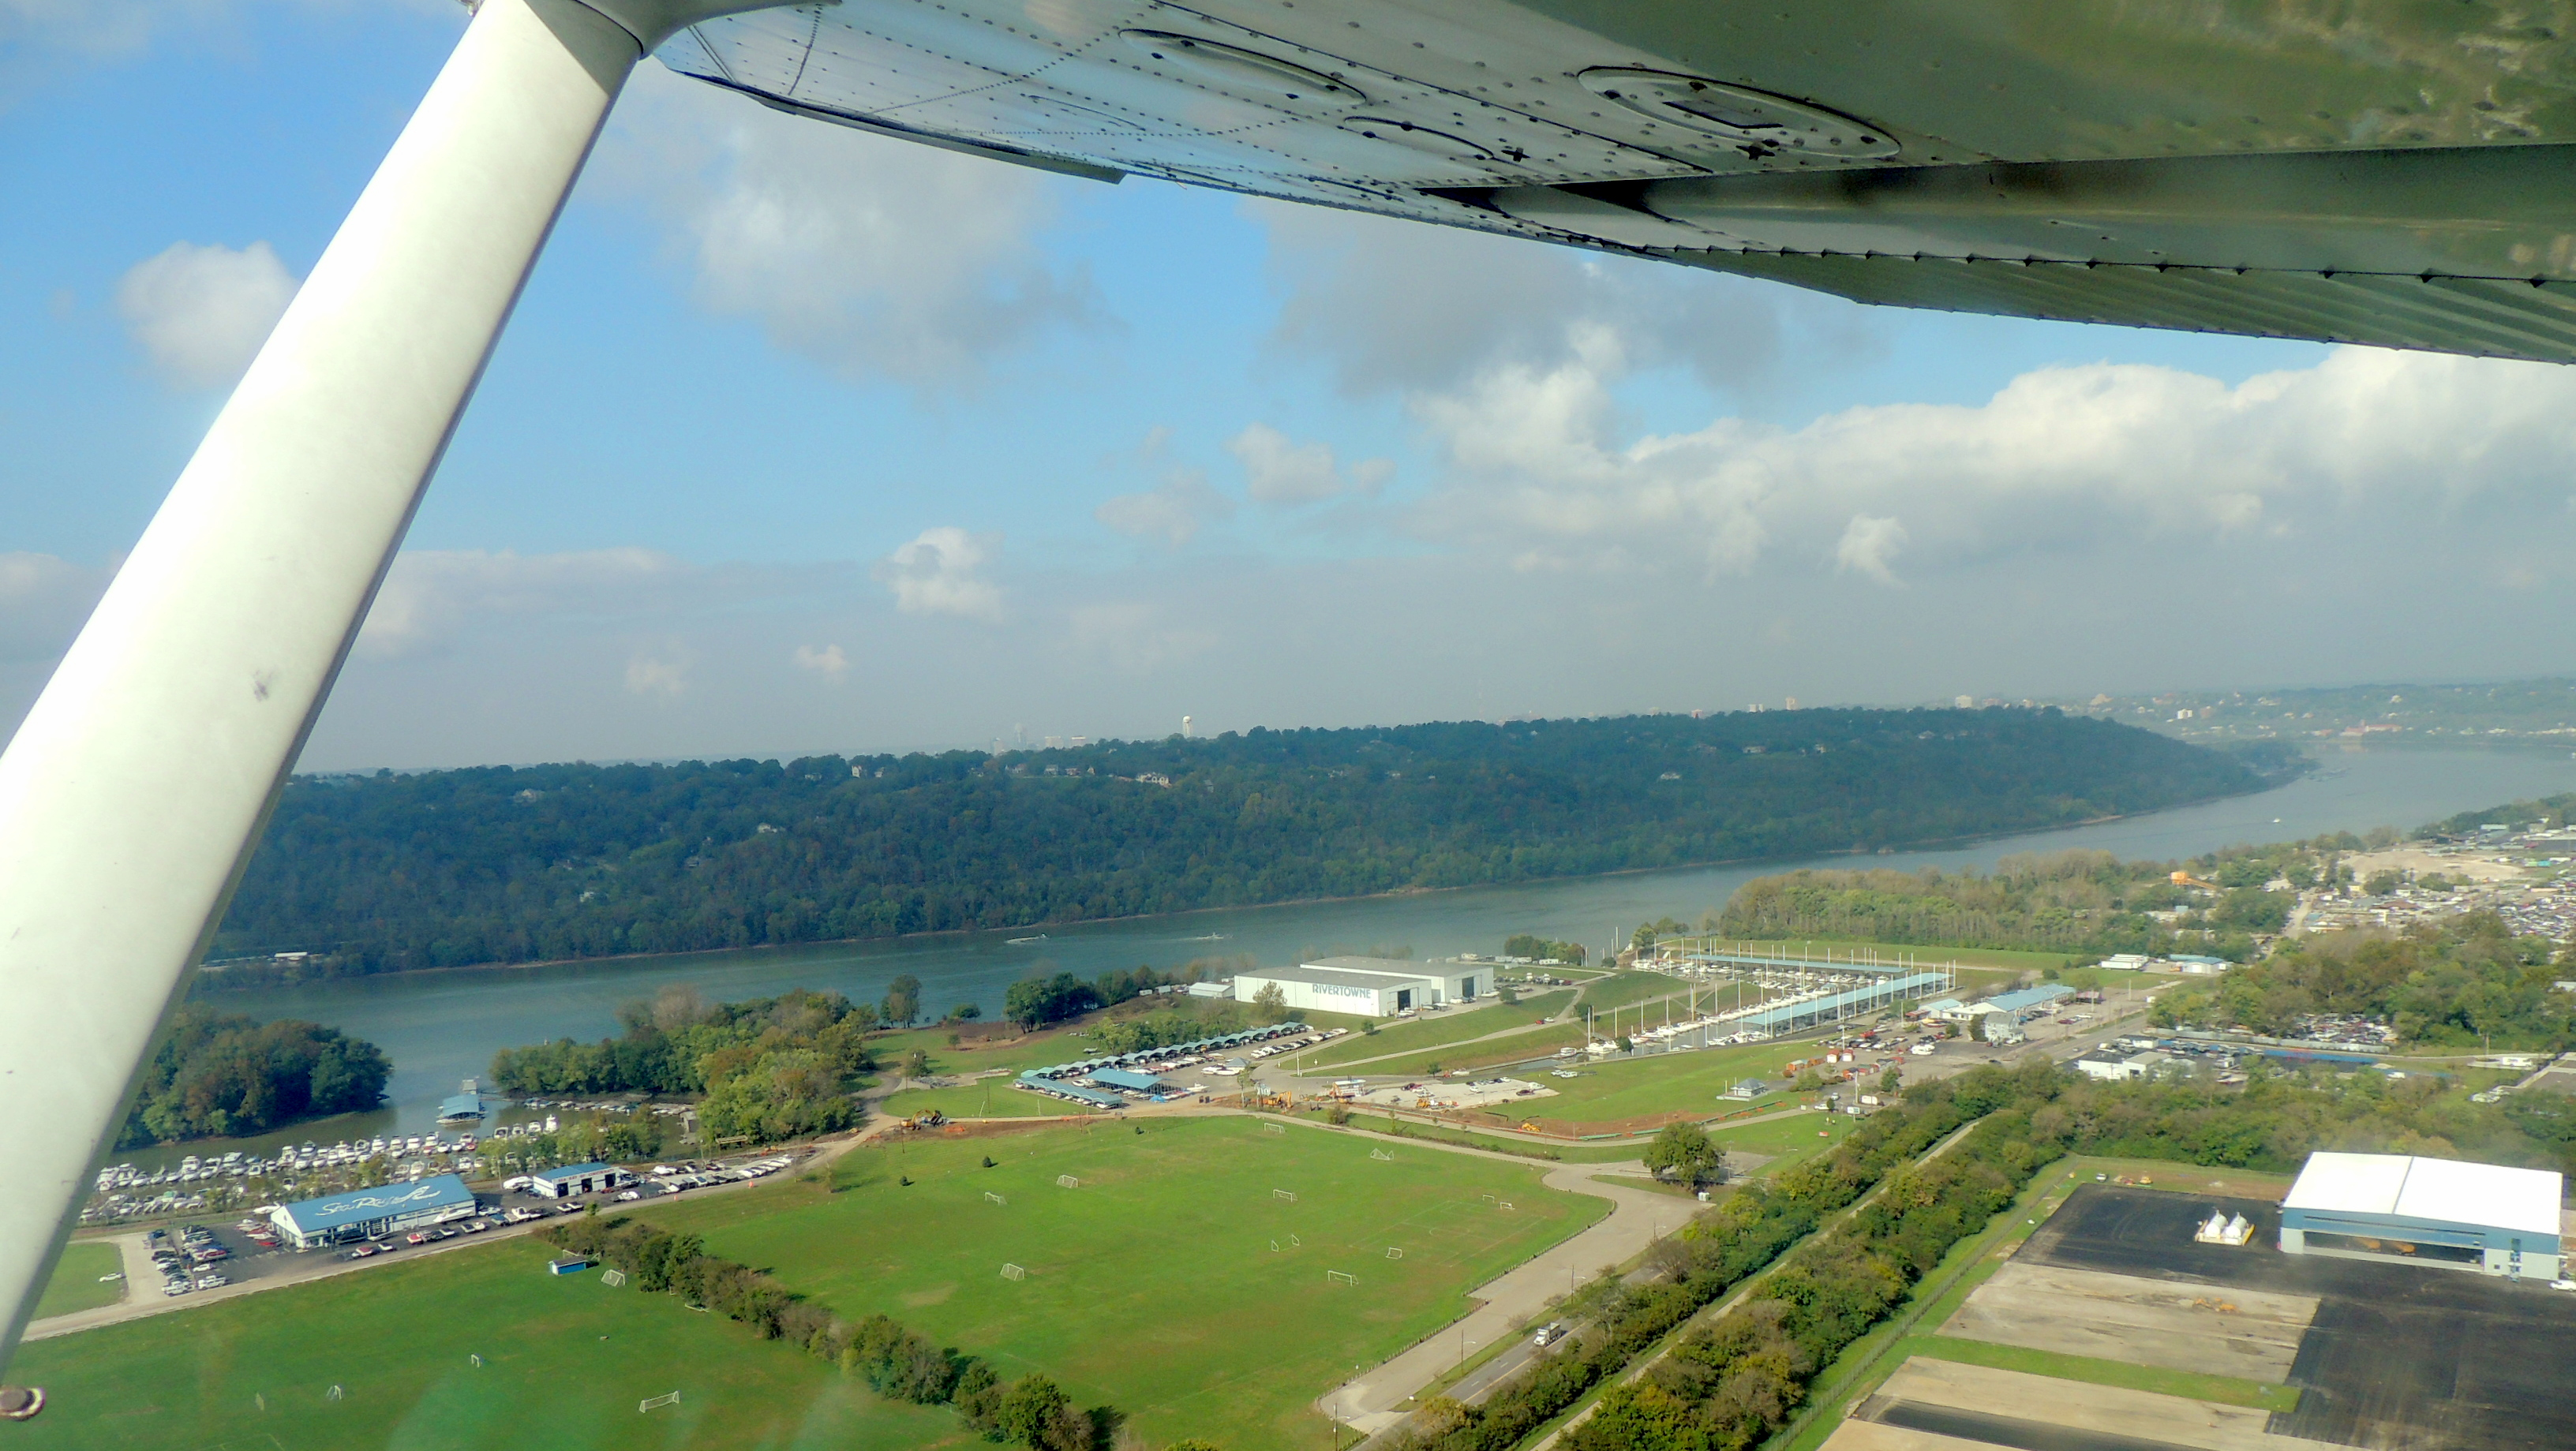 Departing Lunken Field (Cincinnati Ohio) heading for Stafford VA